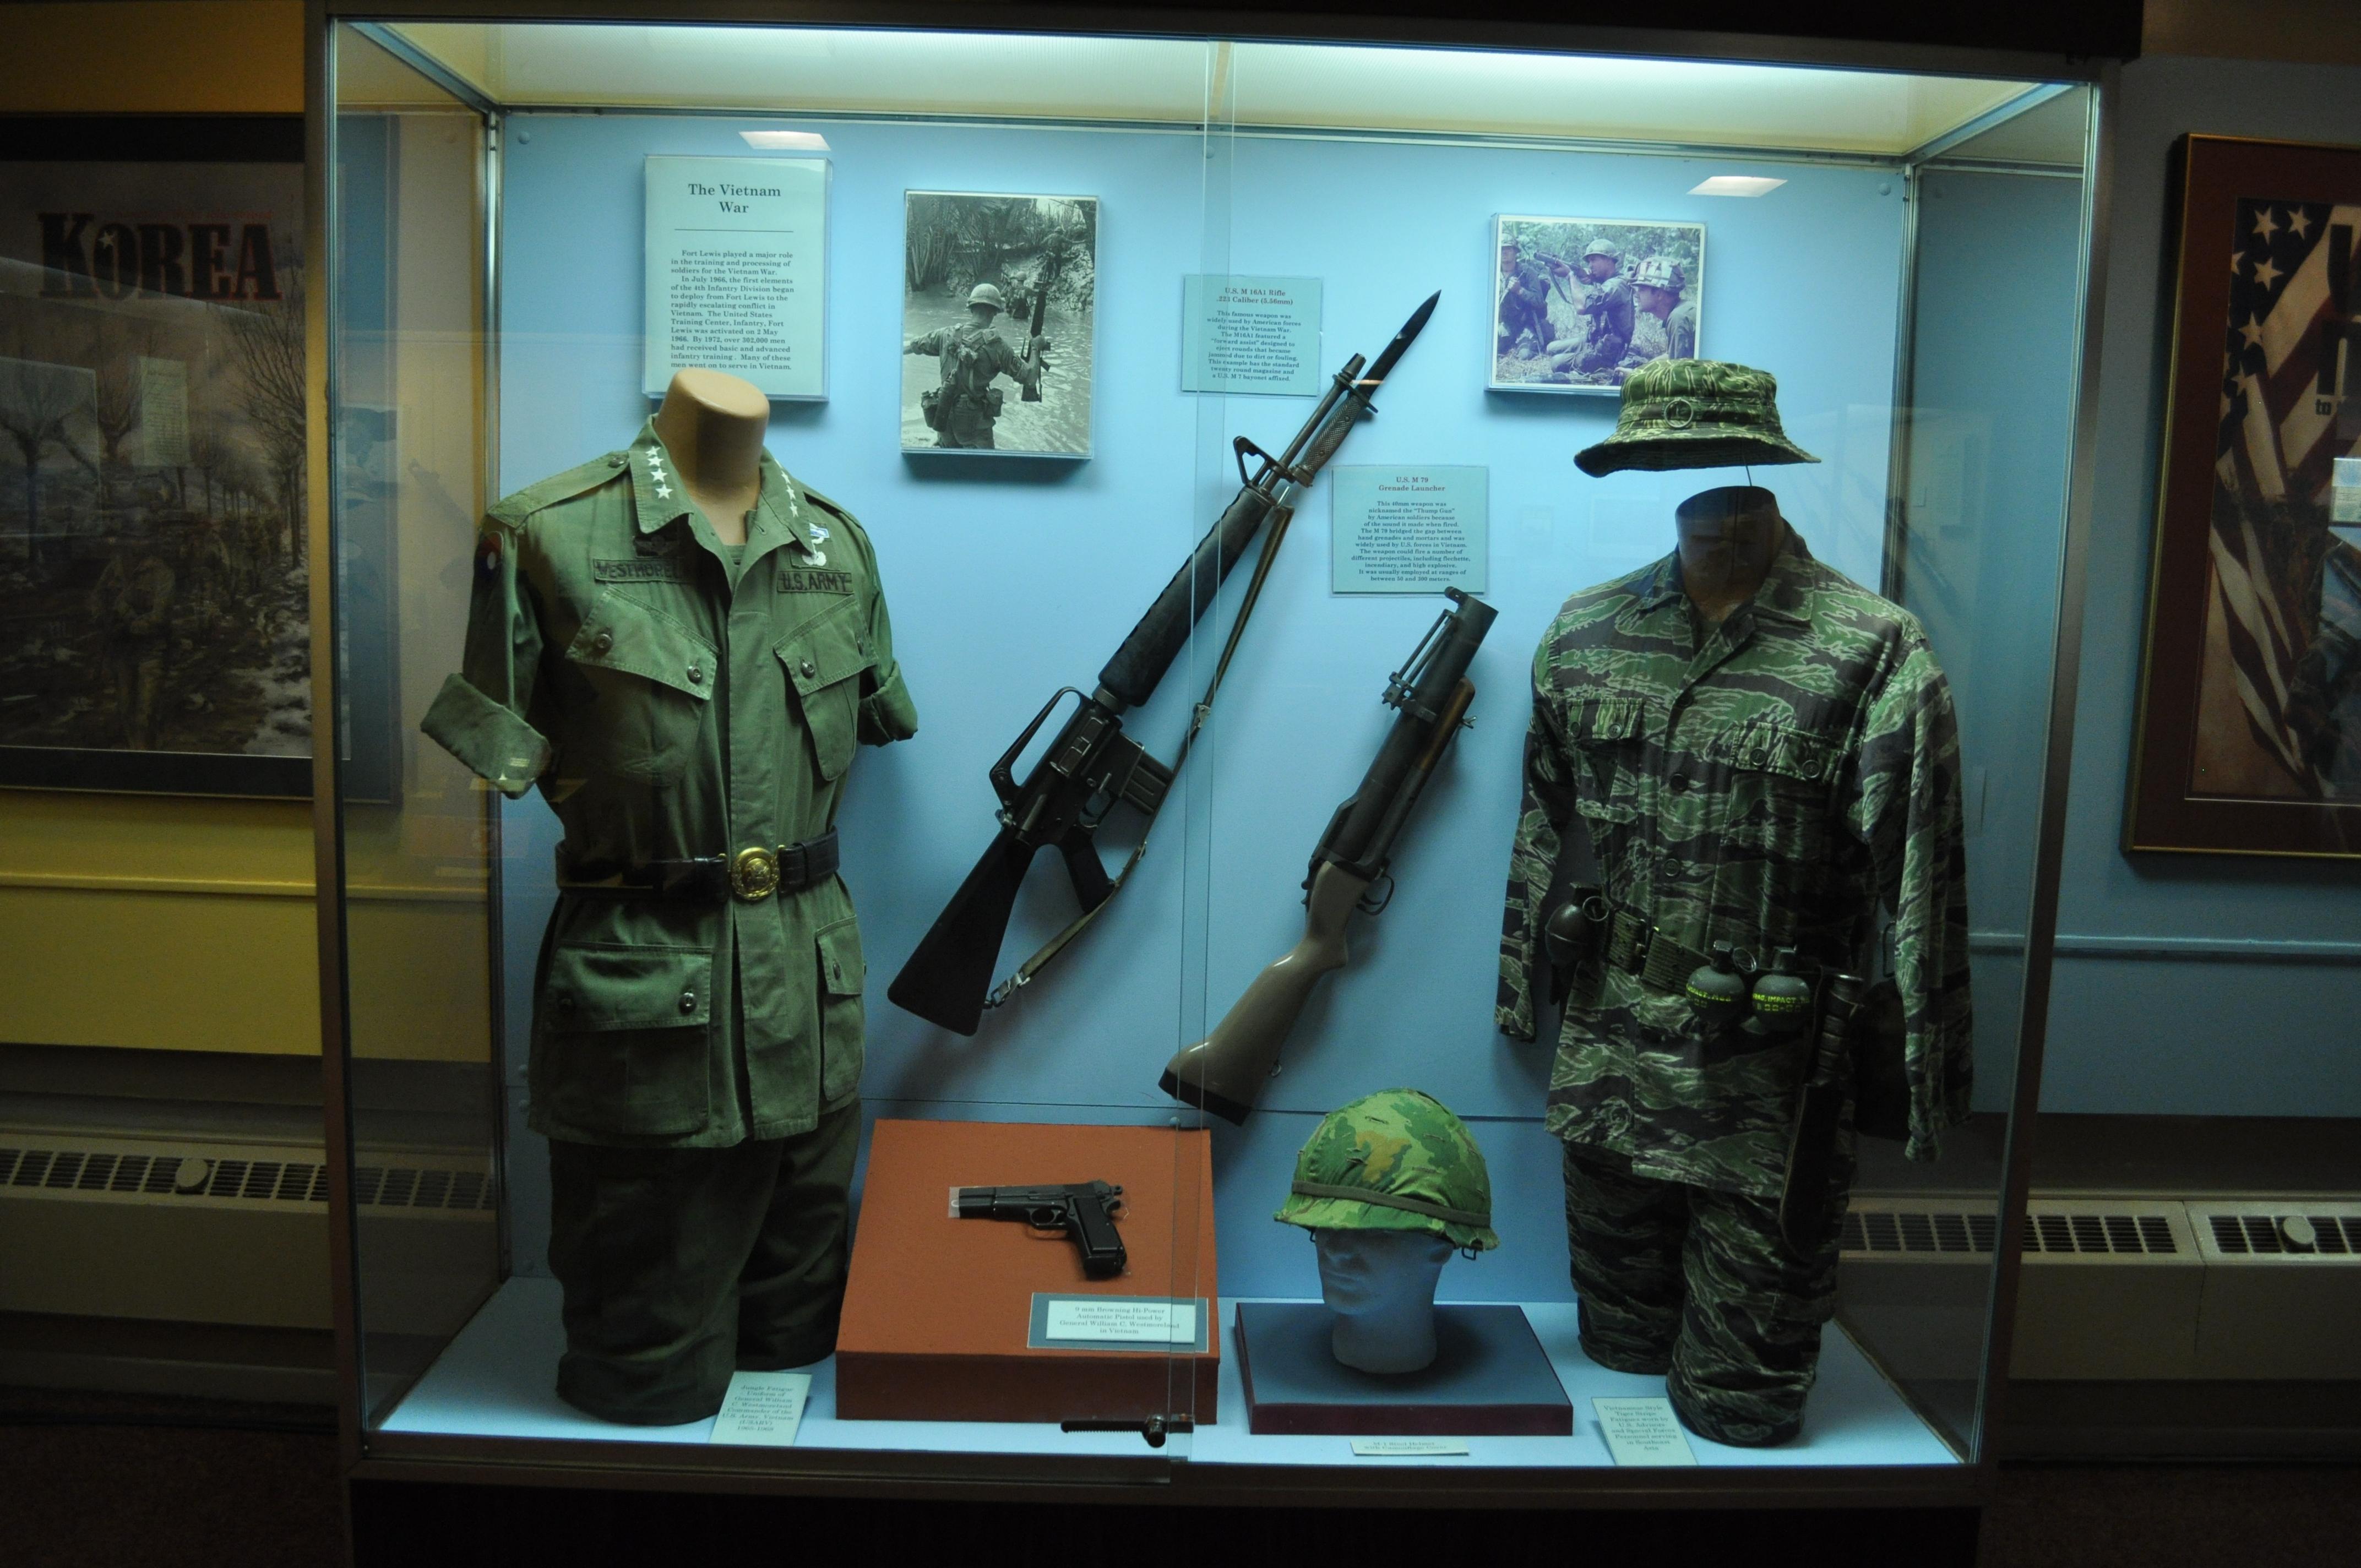 File:FLMM - Vietnam War uniforms & weapons jpg - Wikimedia Commons